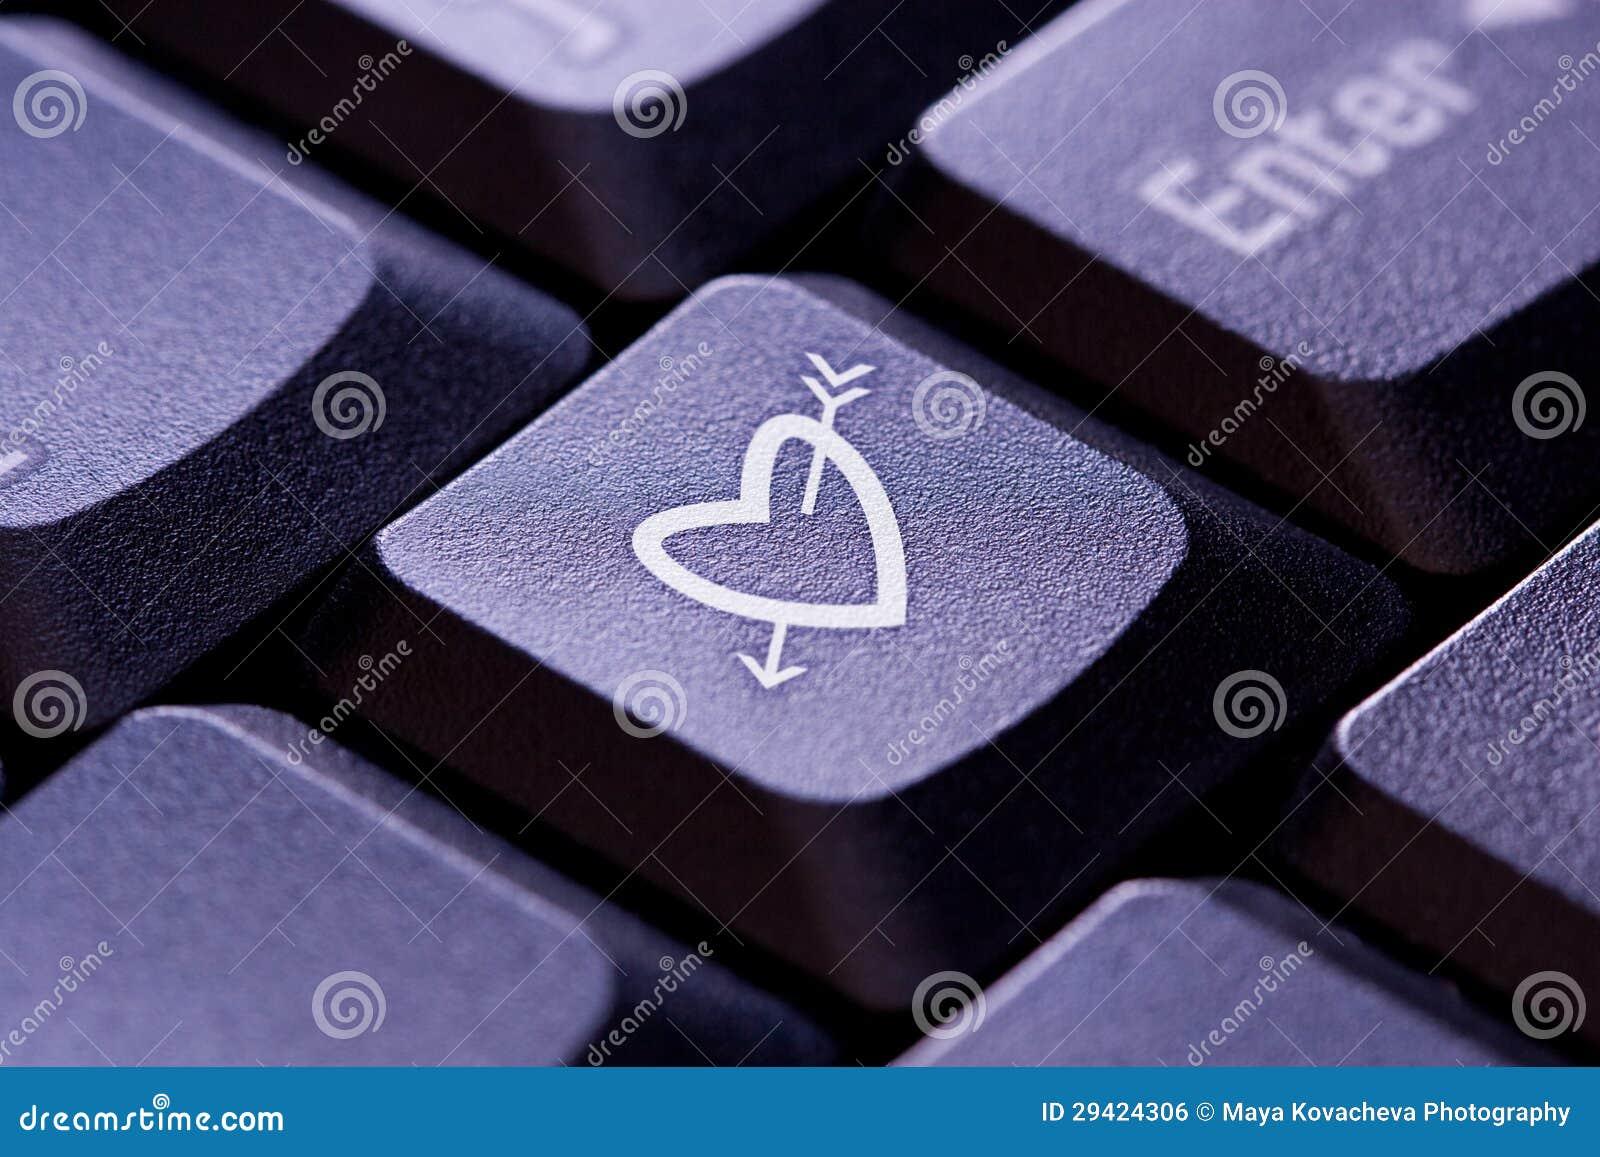 Heart and arrow symbol on computer key stock photo image of online heart and arrow symbol on computer key buycottarizona Choice Image